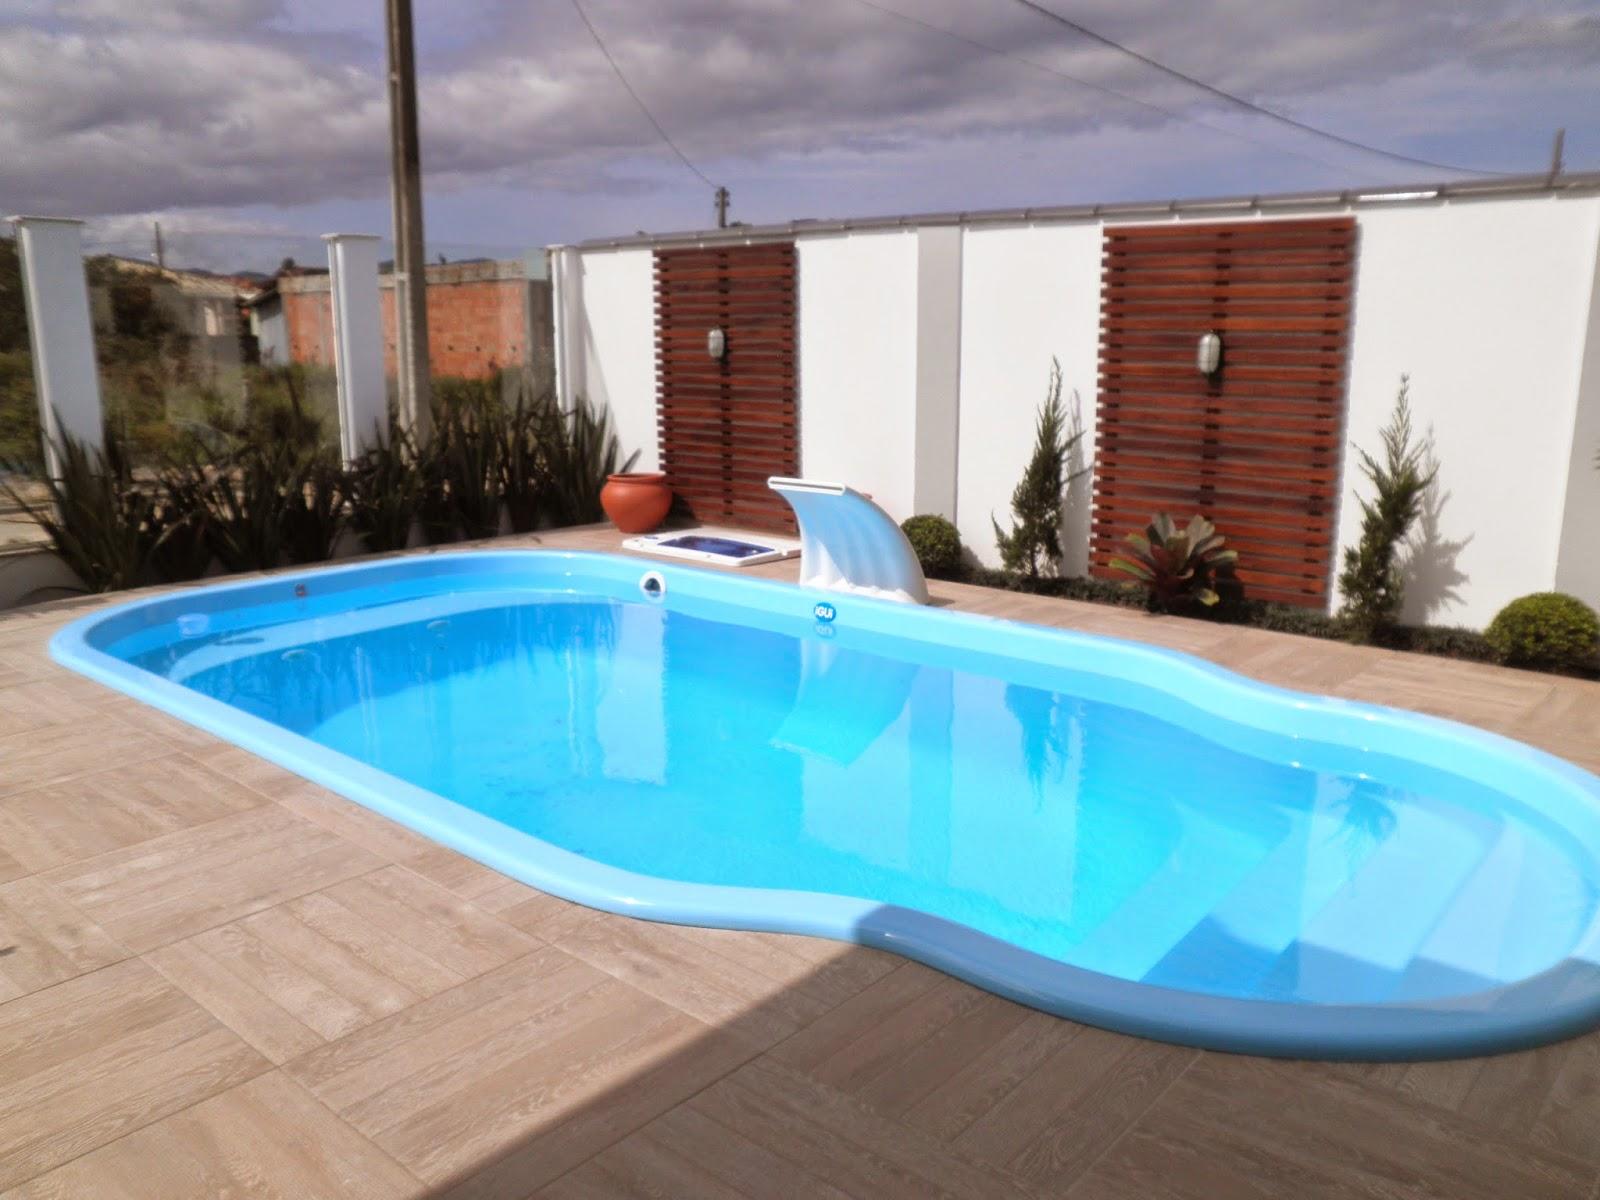 Piscina de piso piso terraza piscina y garaje foto piso for Cubre piscinas bestway